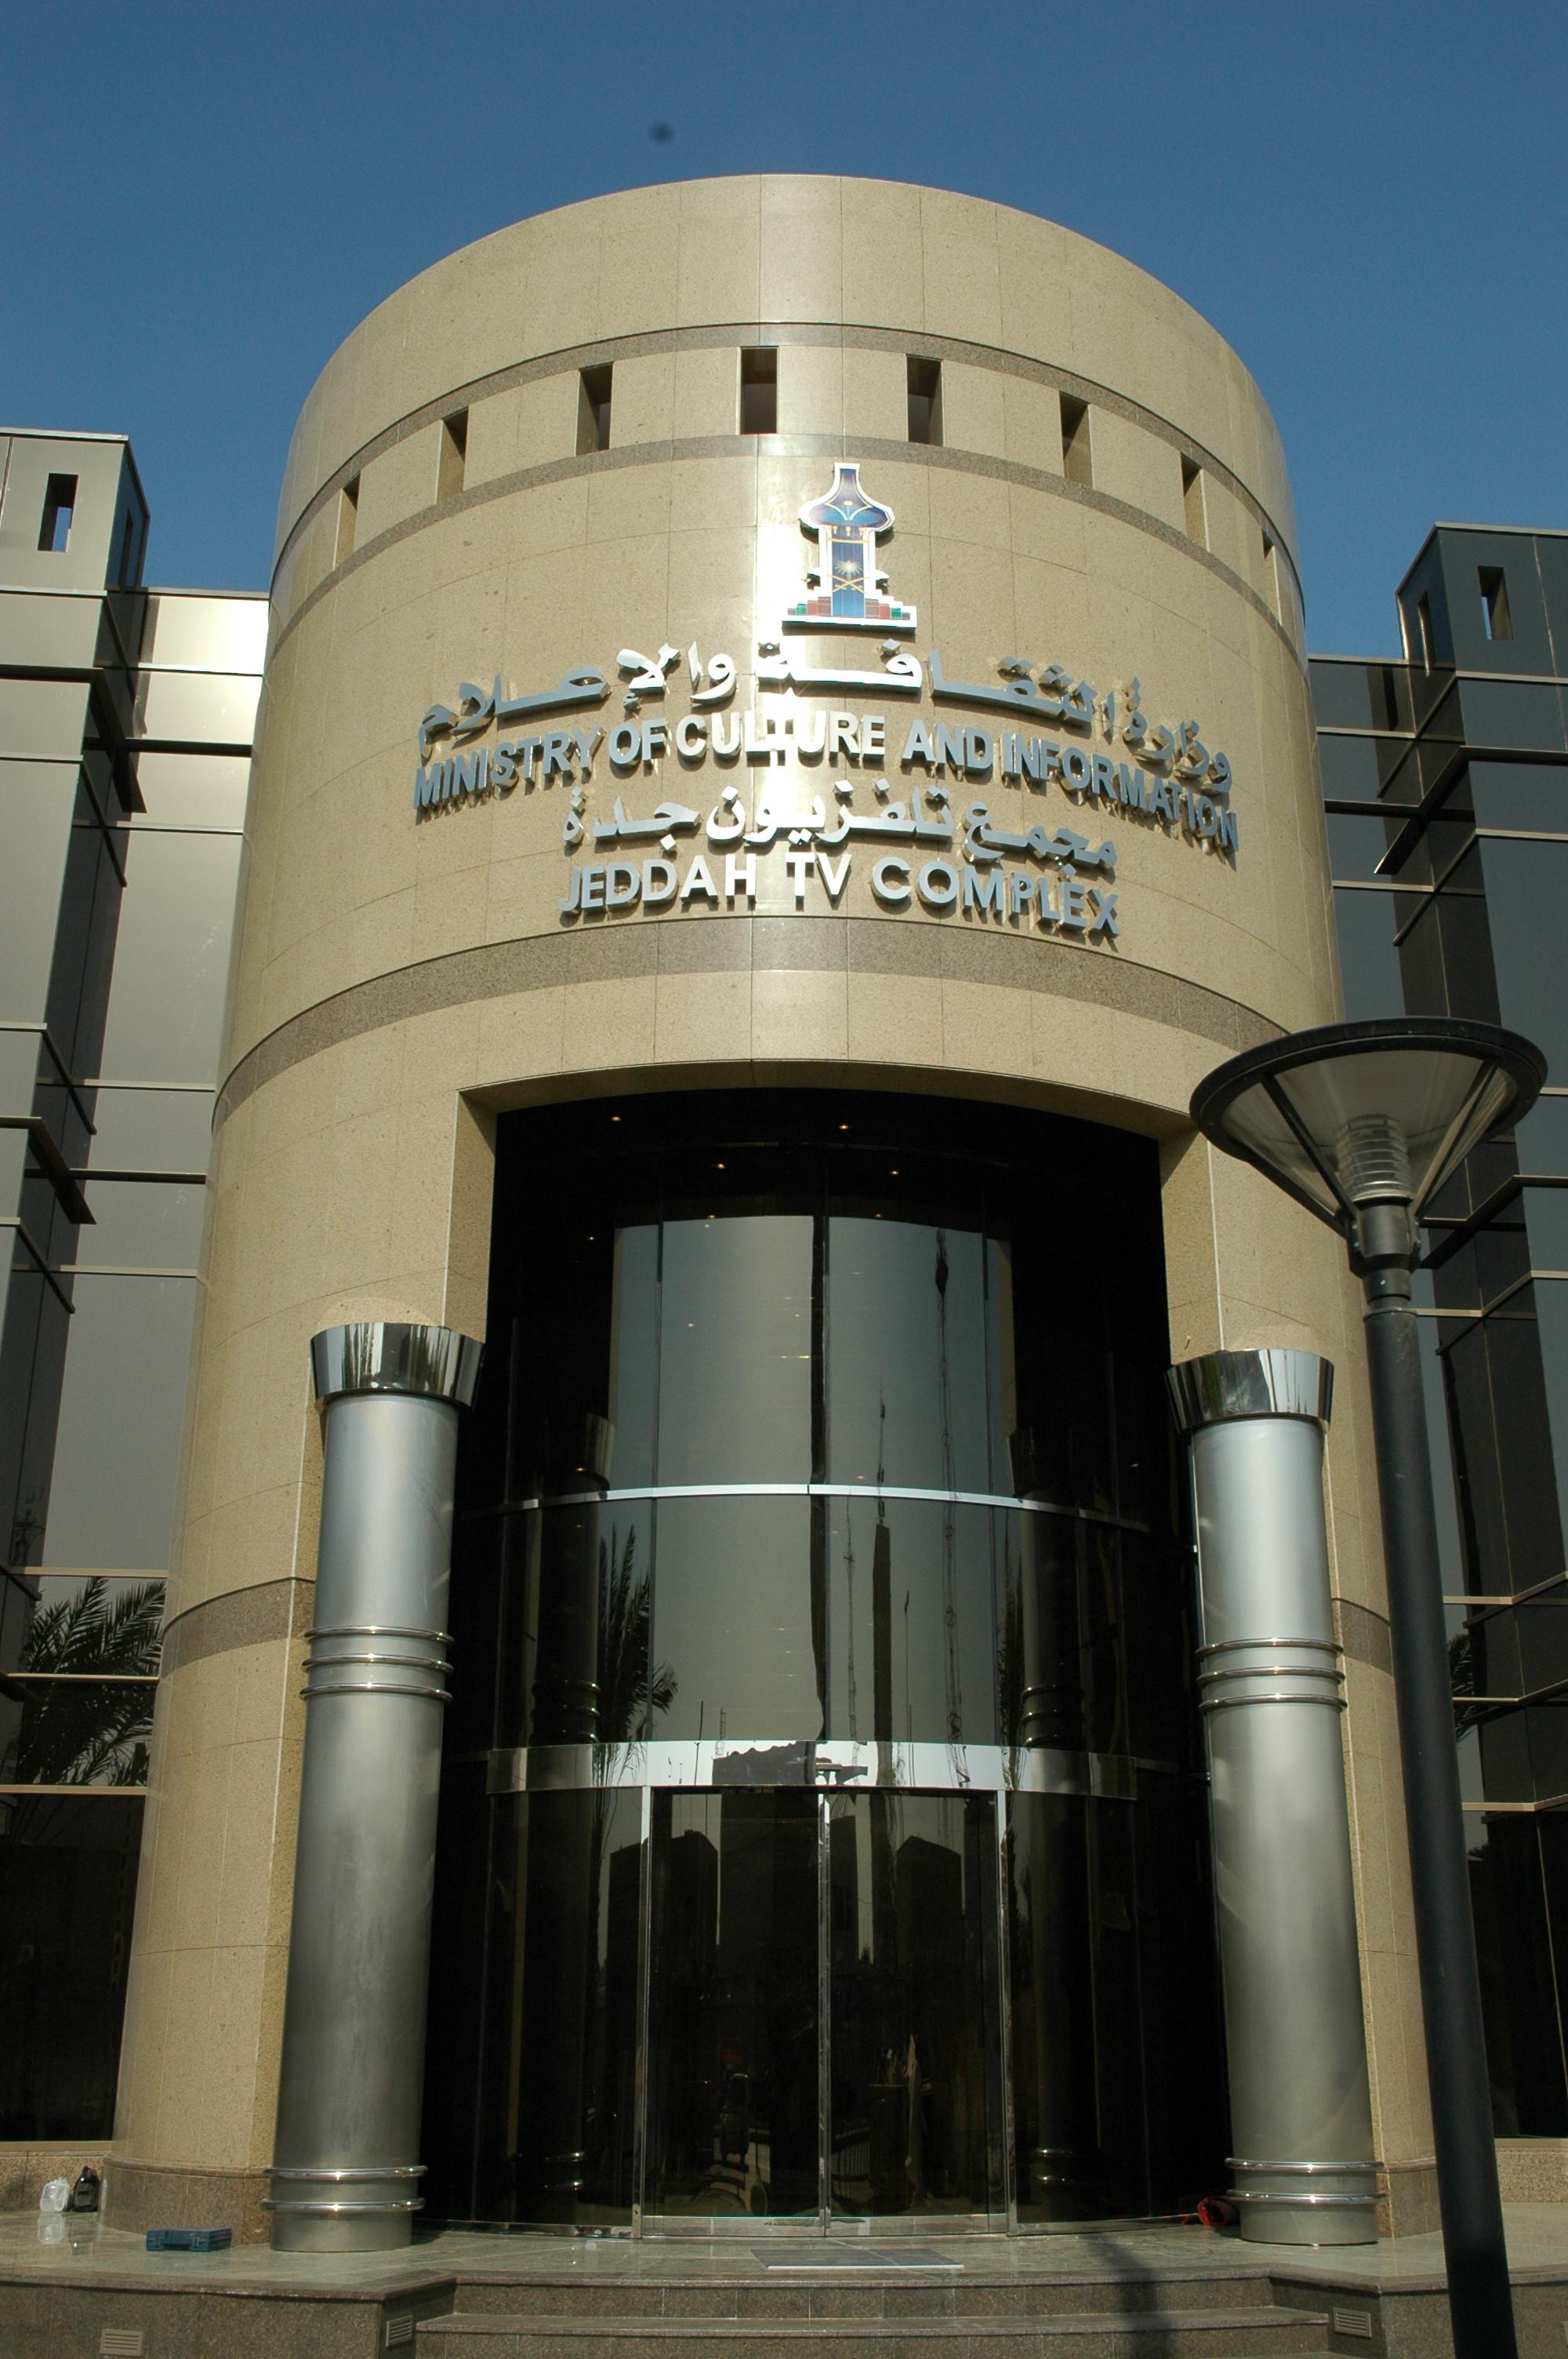 Jeddah TV Complex 01